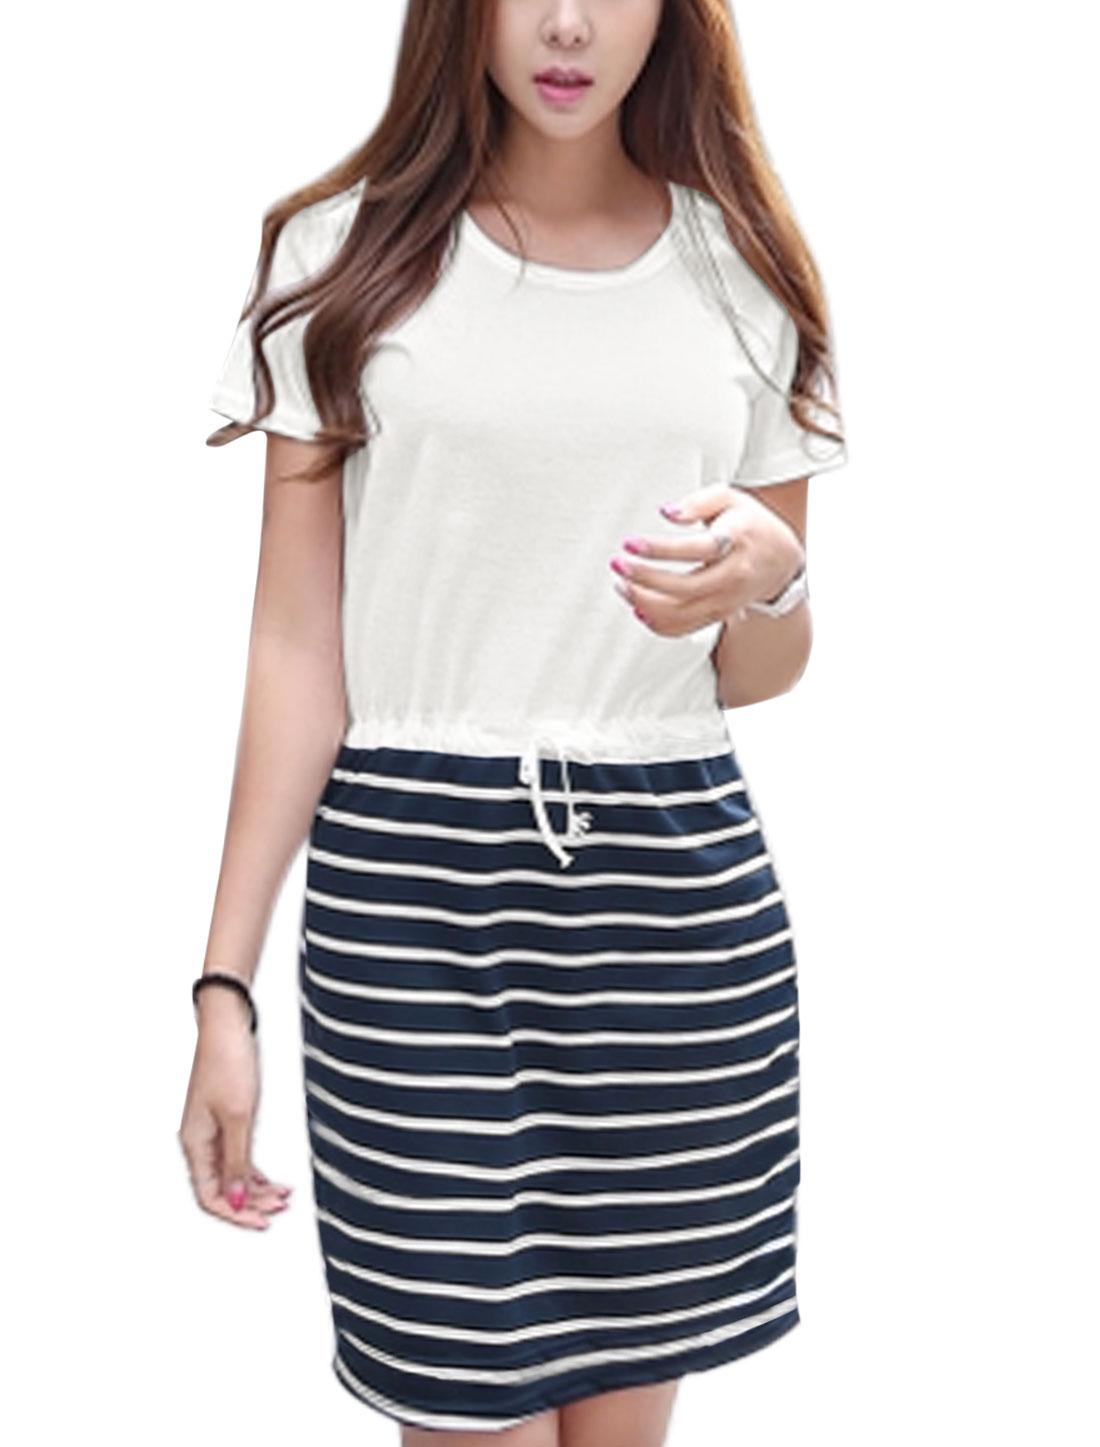 Ladies Short Sleeve Drawstring Waist Stripes T-Shirt Dress White Navy Blue S